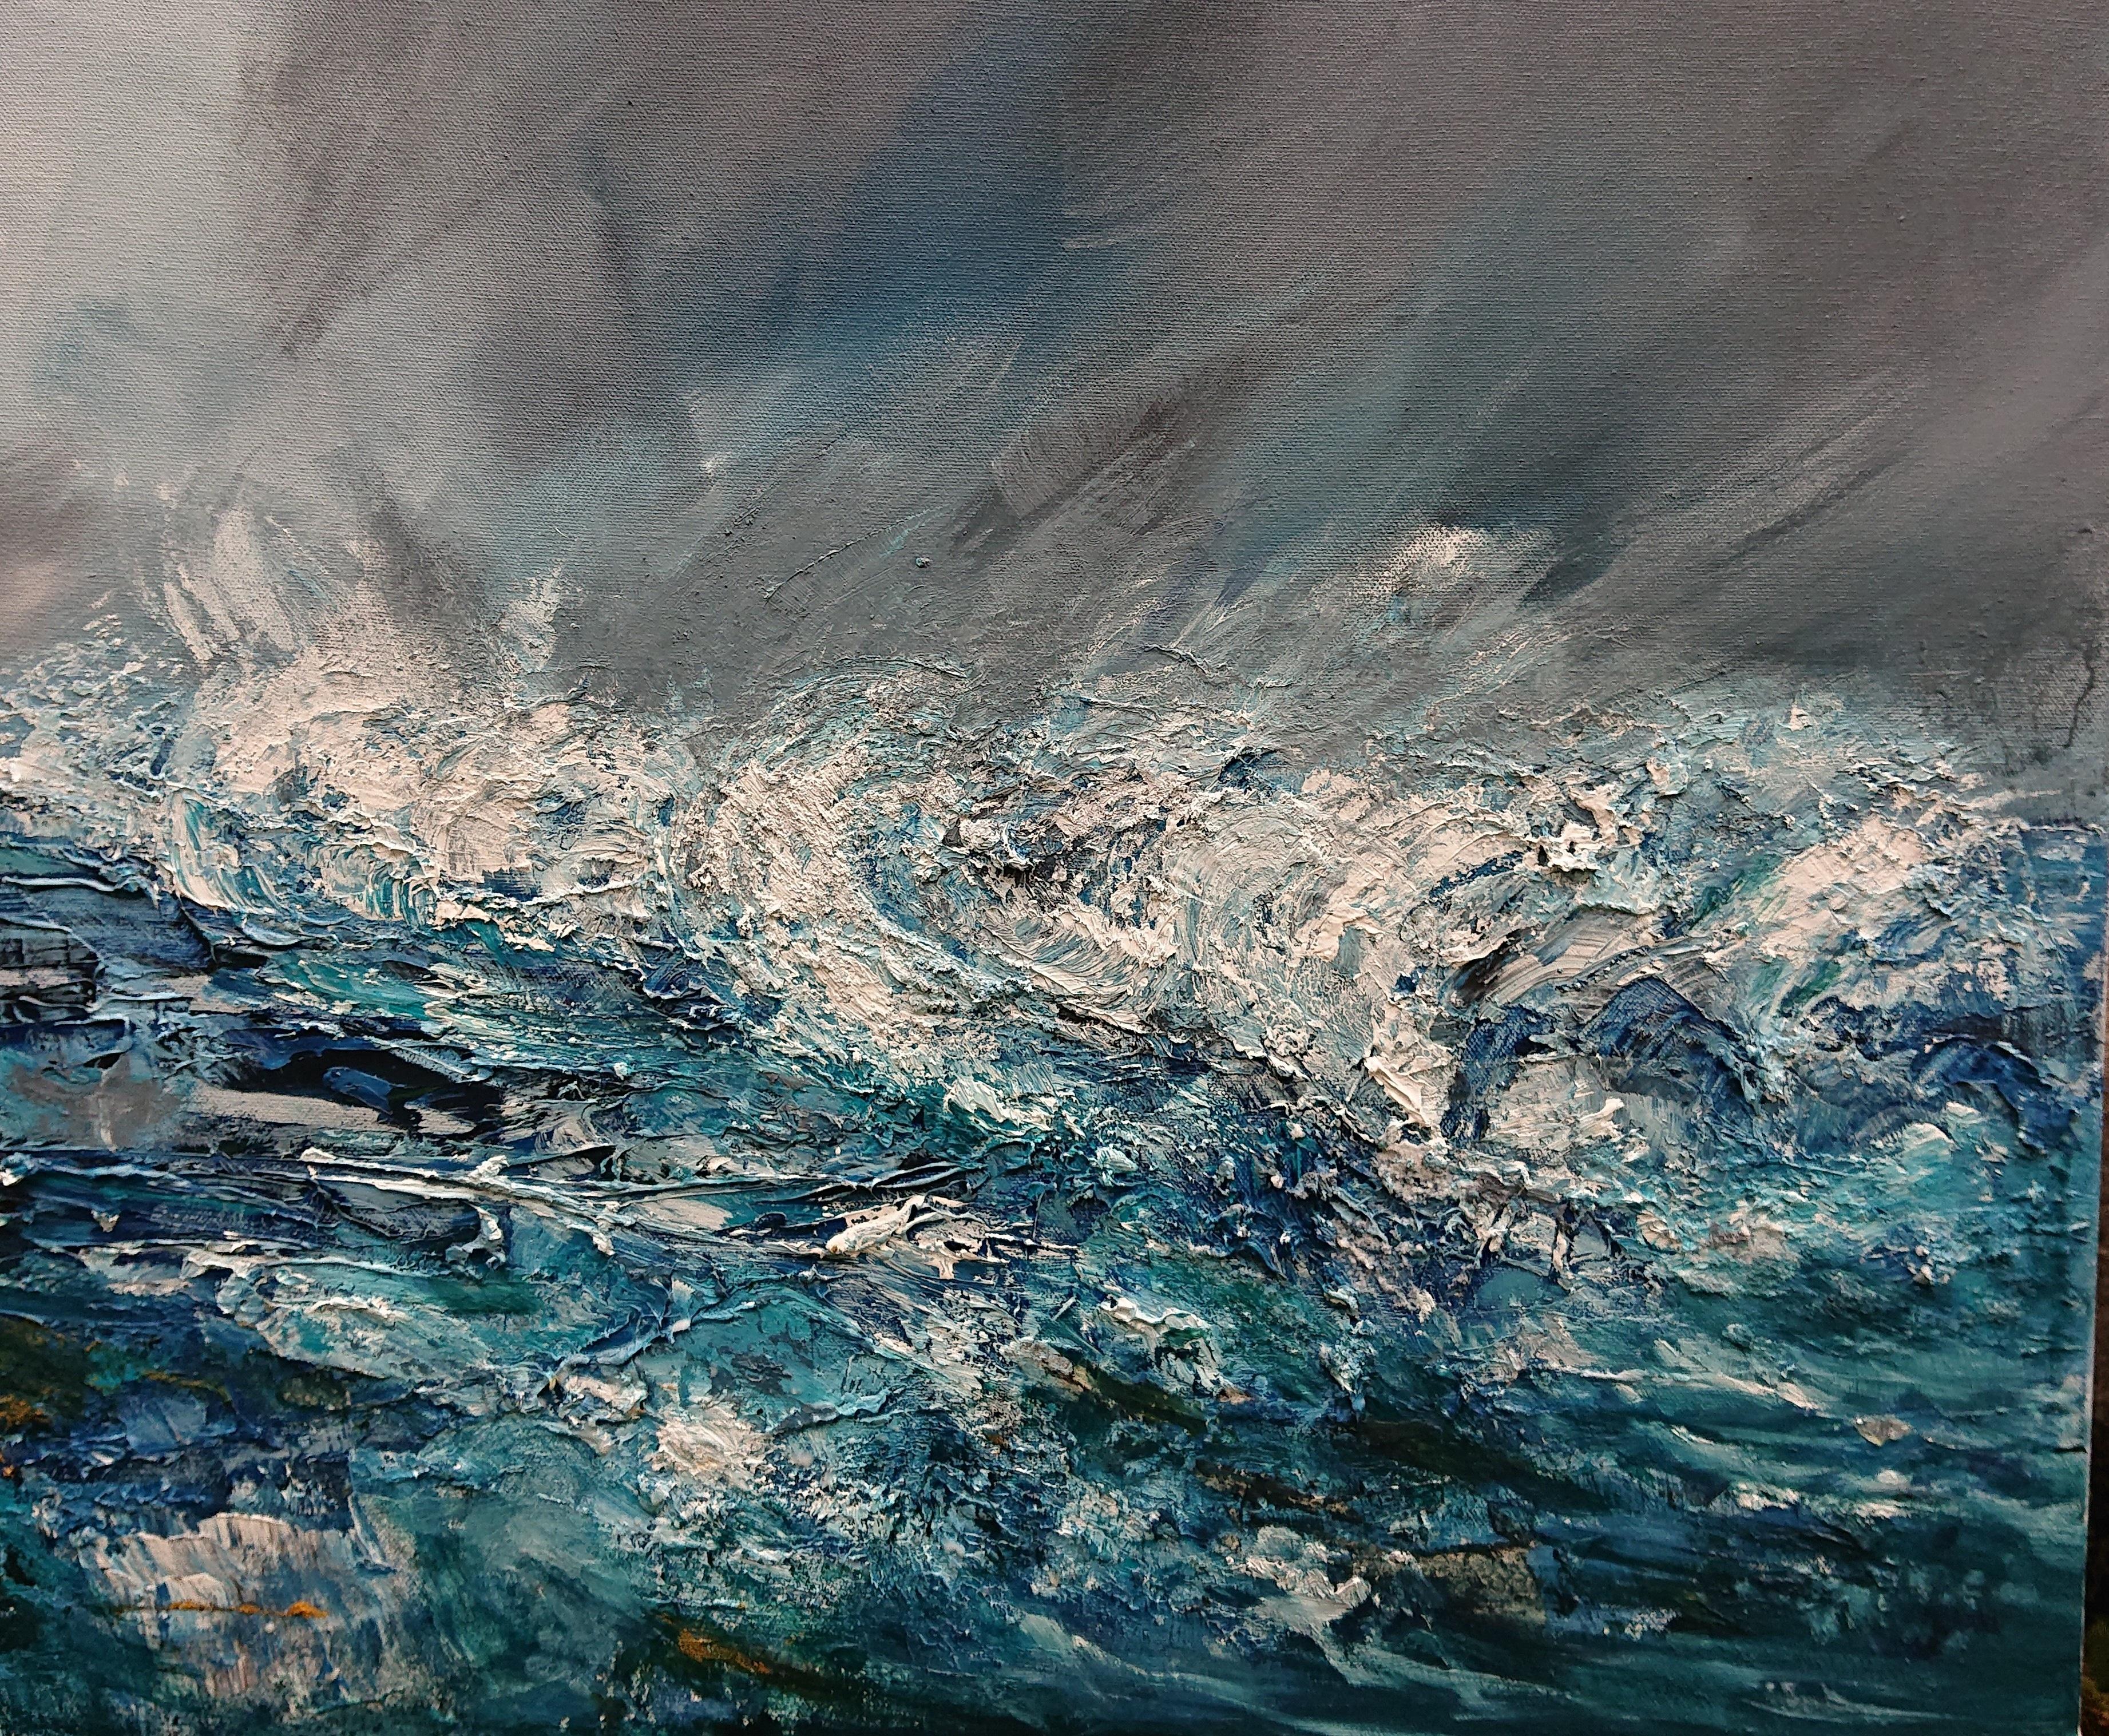 winter storm hosta, oil on canvas, 70 x 90 cm